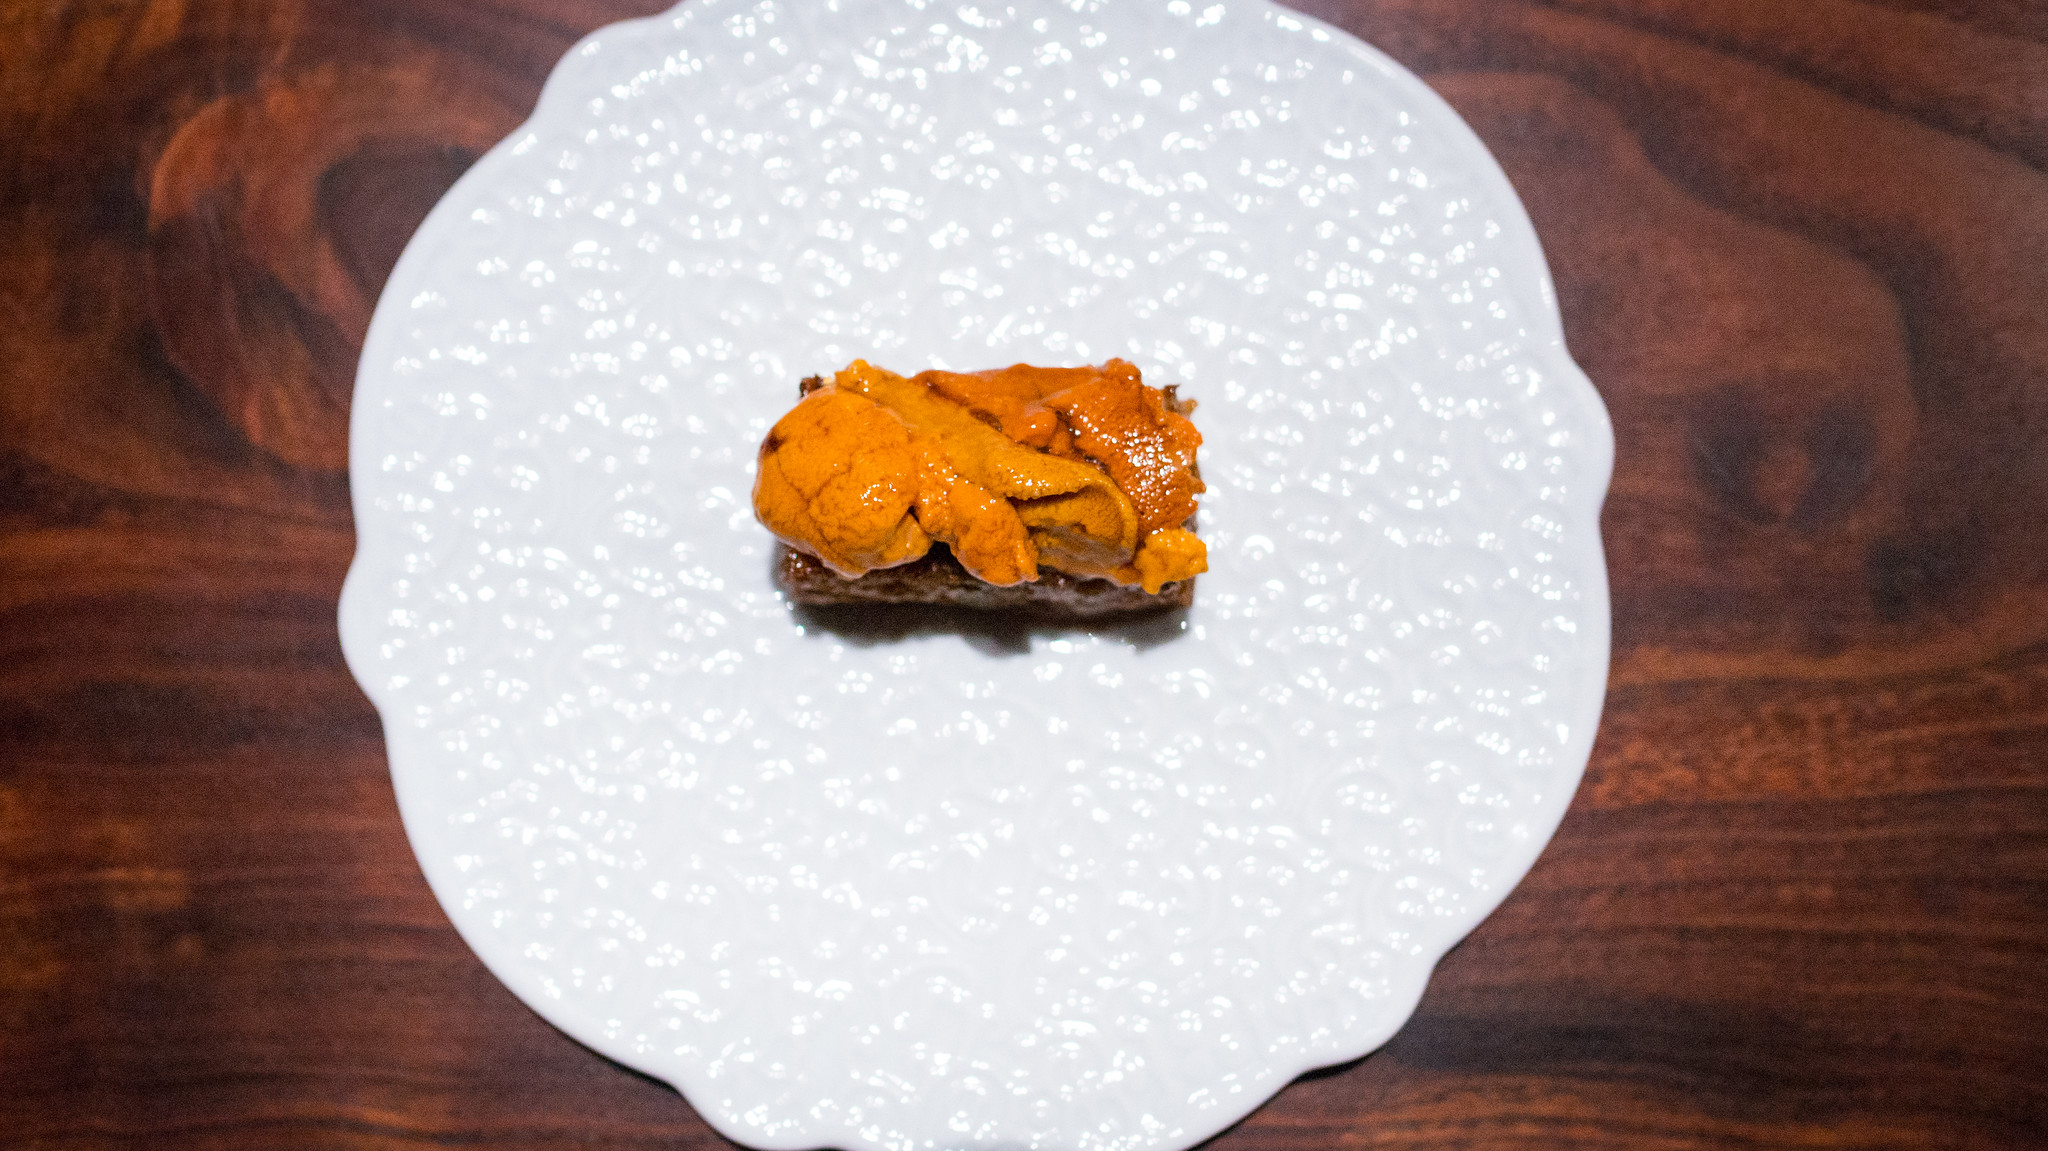 food for thought | a miami food blog: Saison - San Francisco